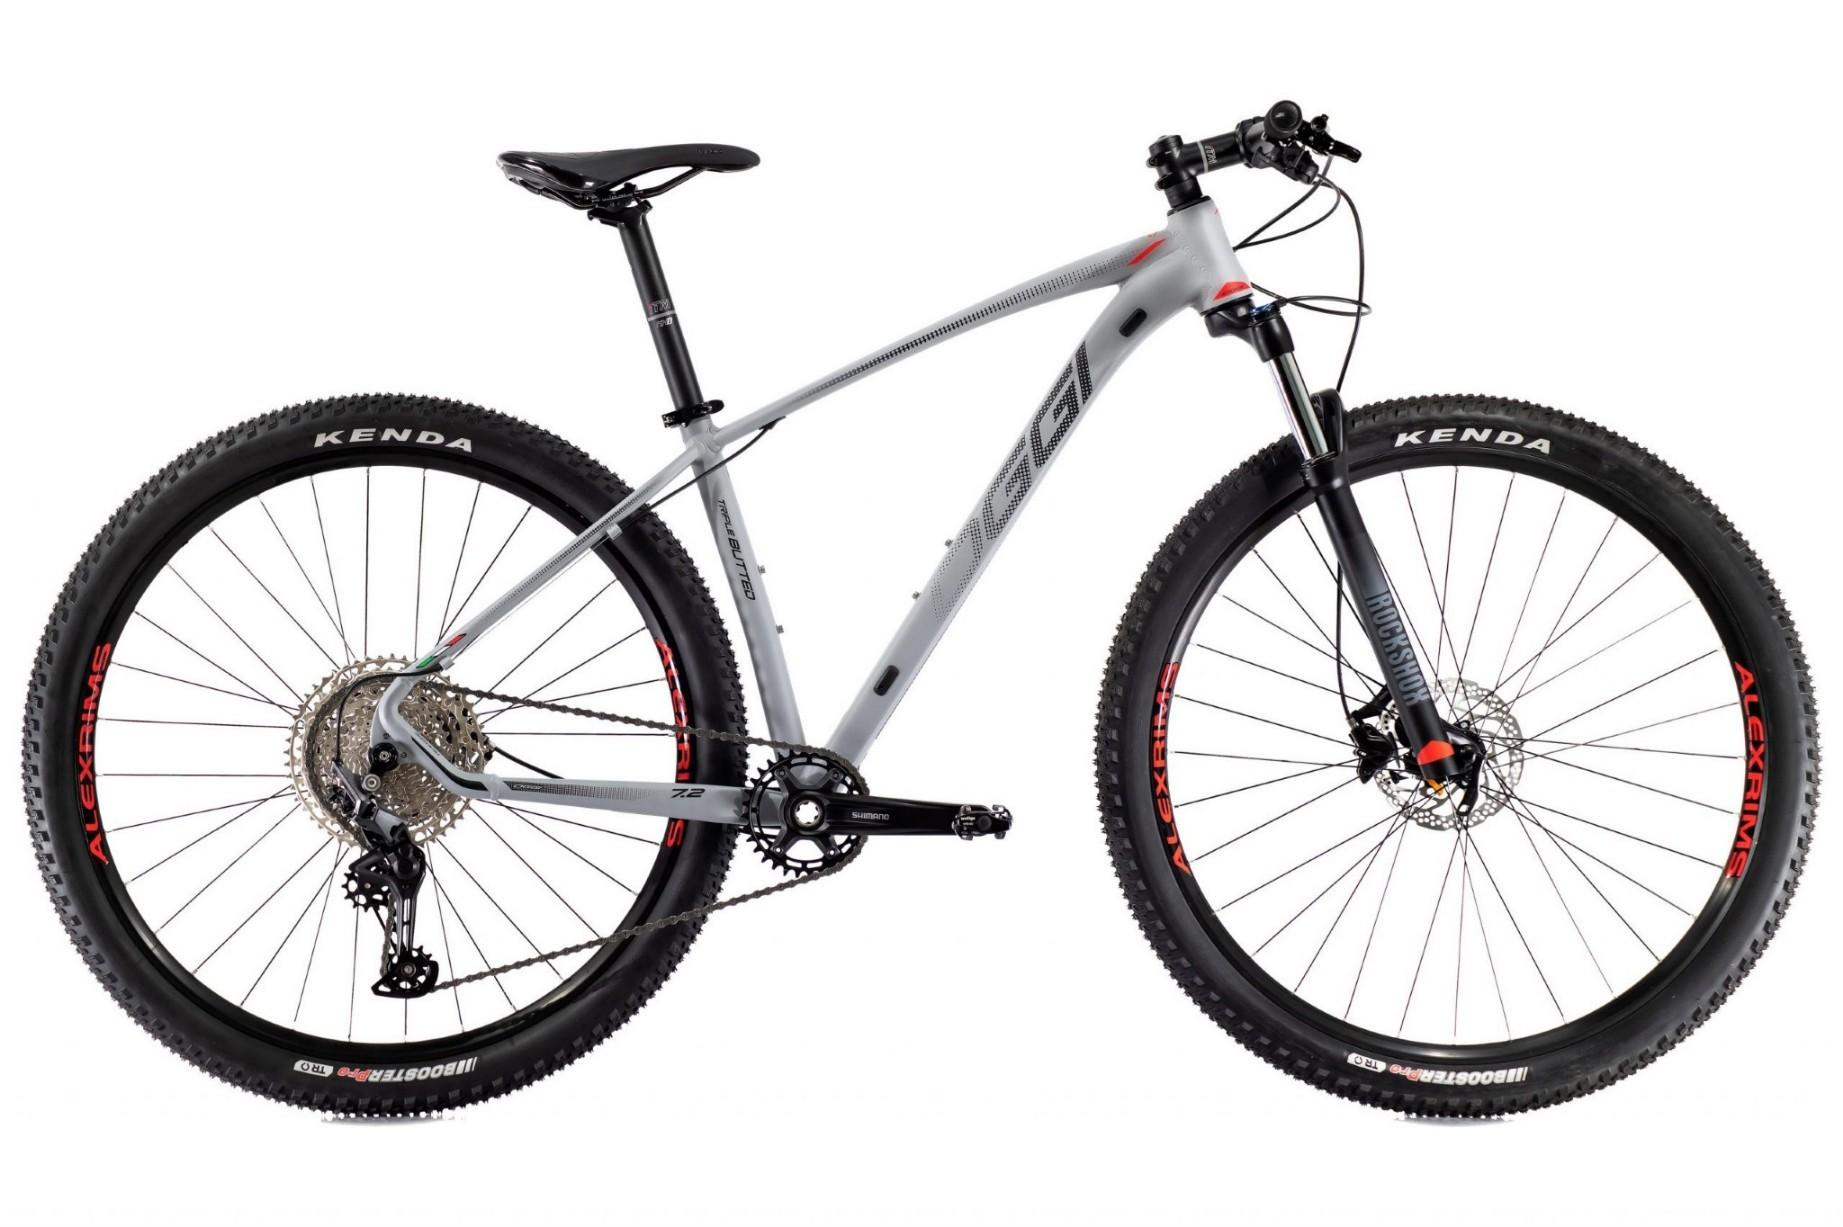 Bicicleta OGGI Big Wheel 7.2 2021 - 11v Shimano Deore - Freio Shimano Hidráulico - Cinza/Vermelho